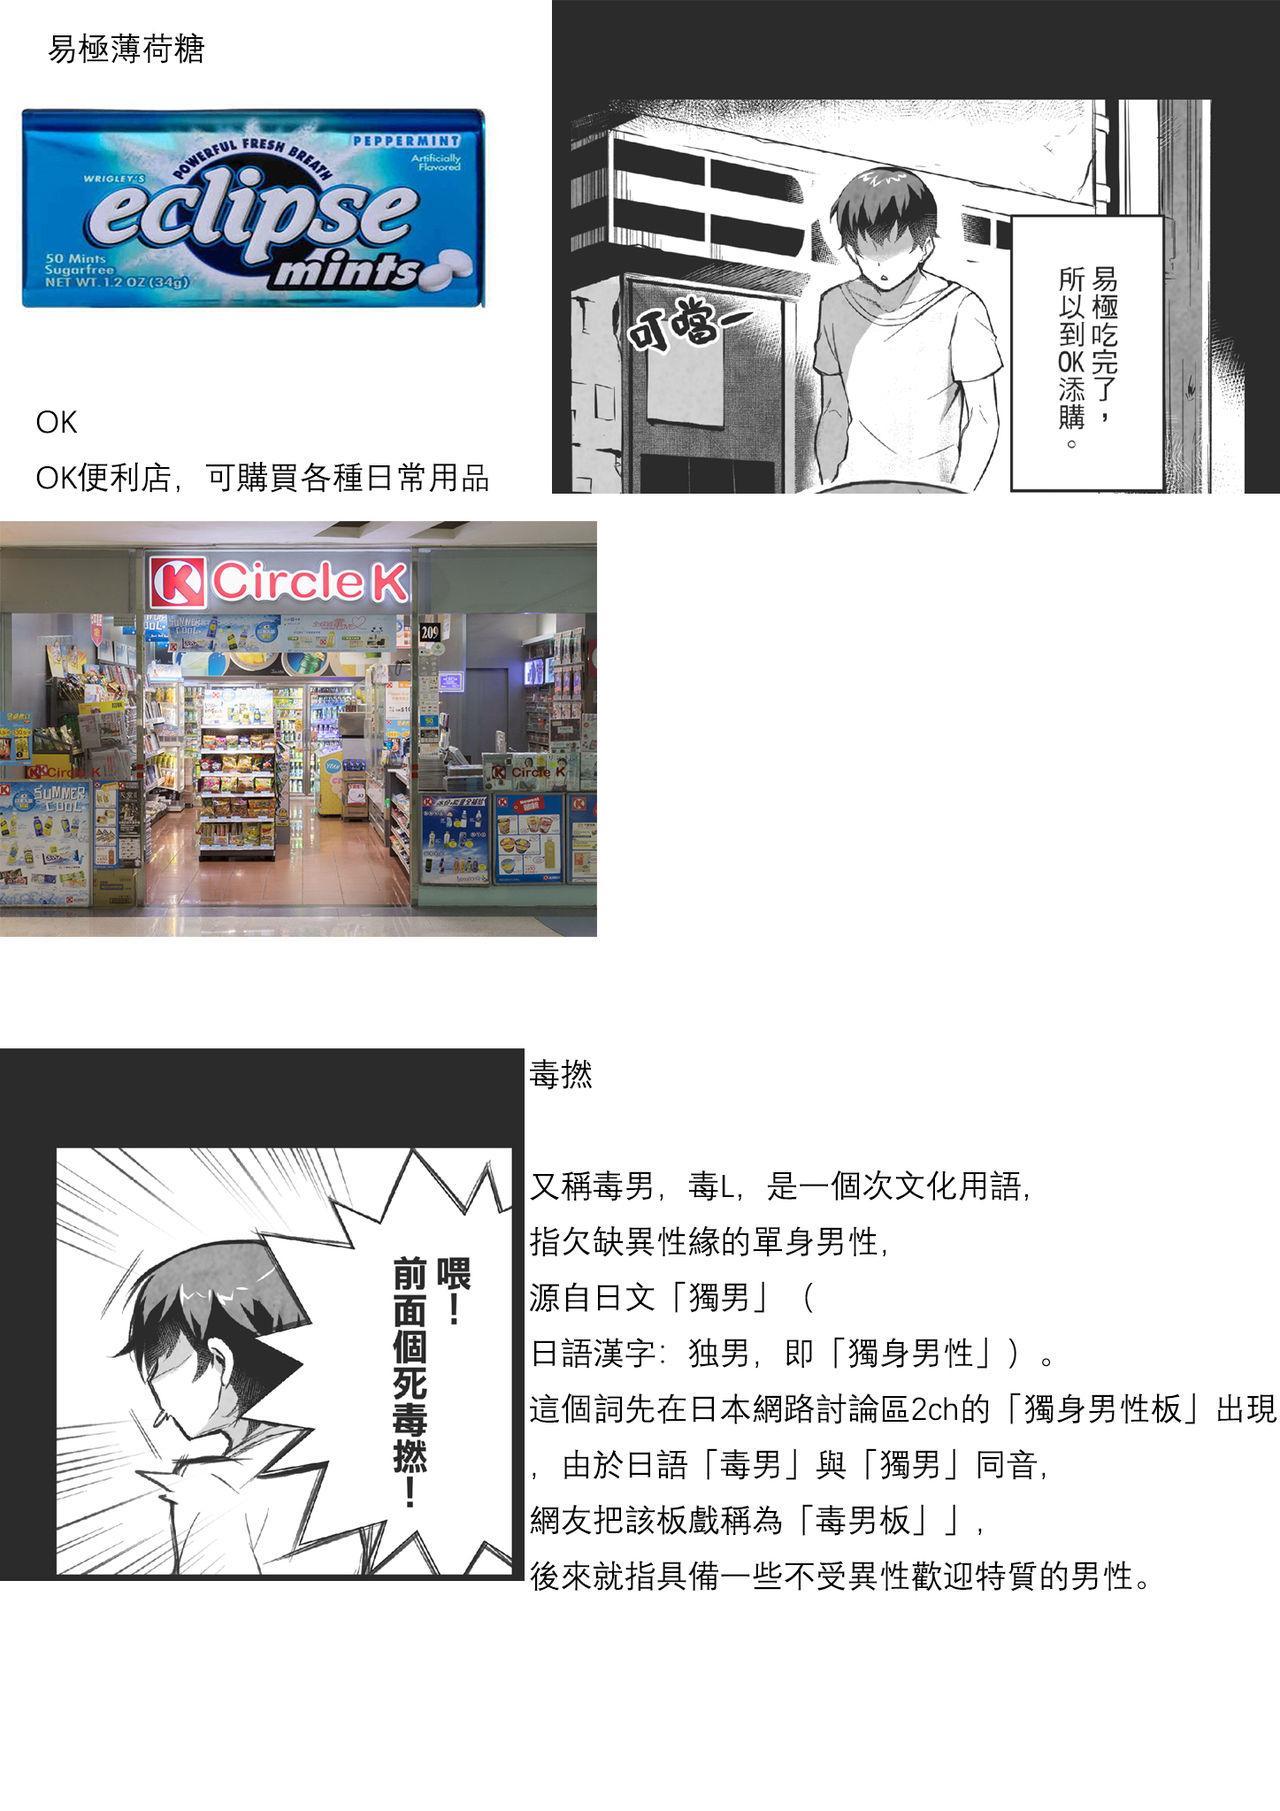 [Gantou Ikunoro] MK girl embodies the spirit of Hong Kong under the Lion Rock [Chinese]  [君廣東話本當上手機翻漢化組] v2 29